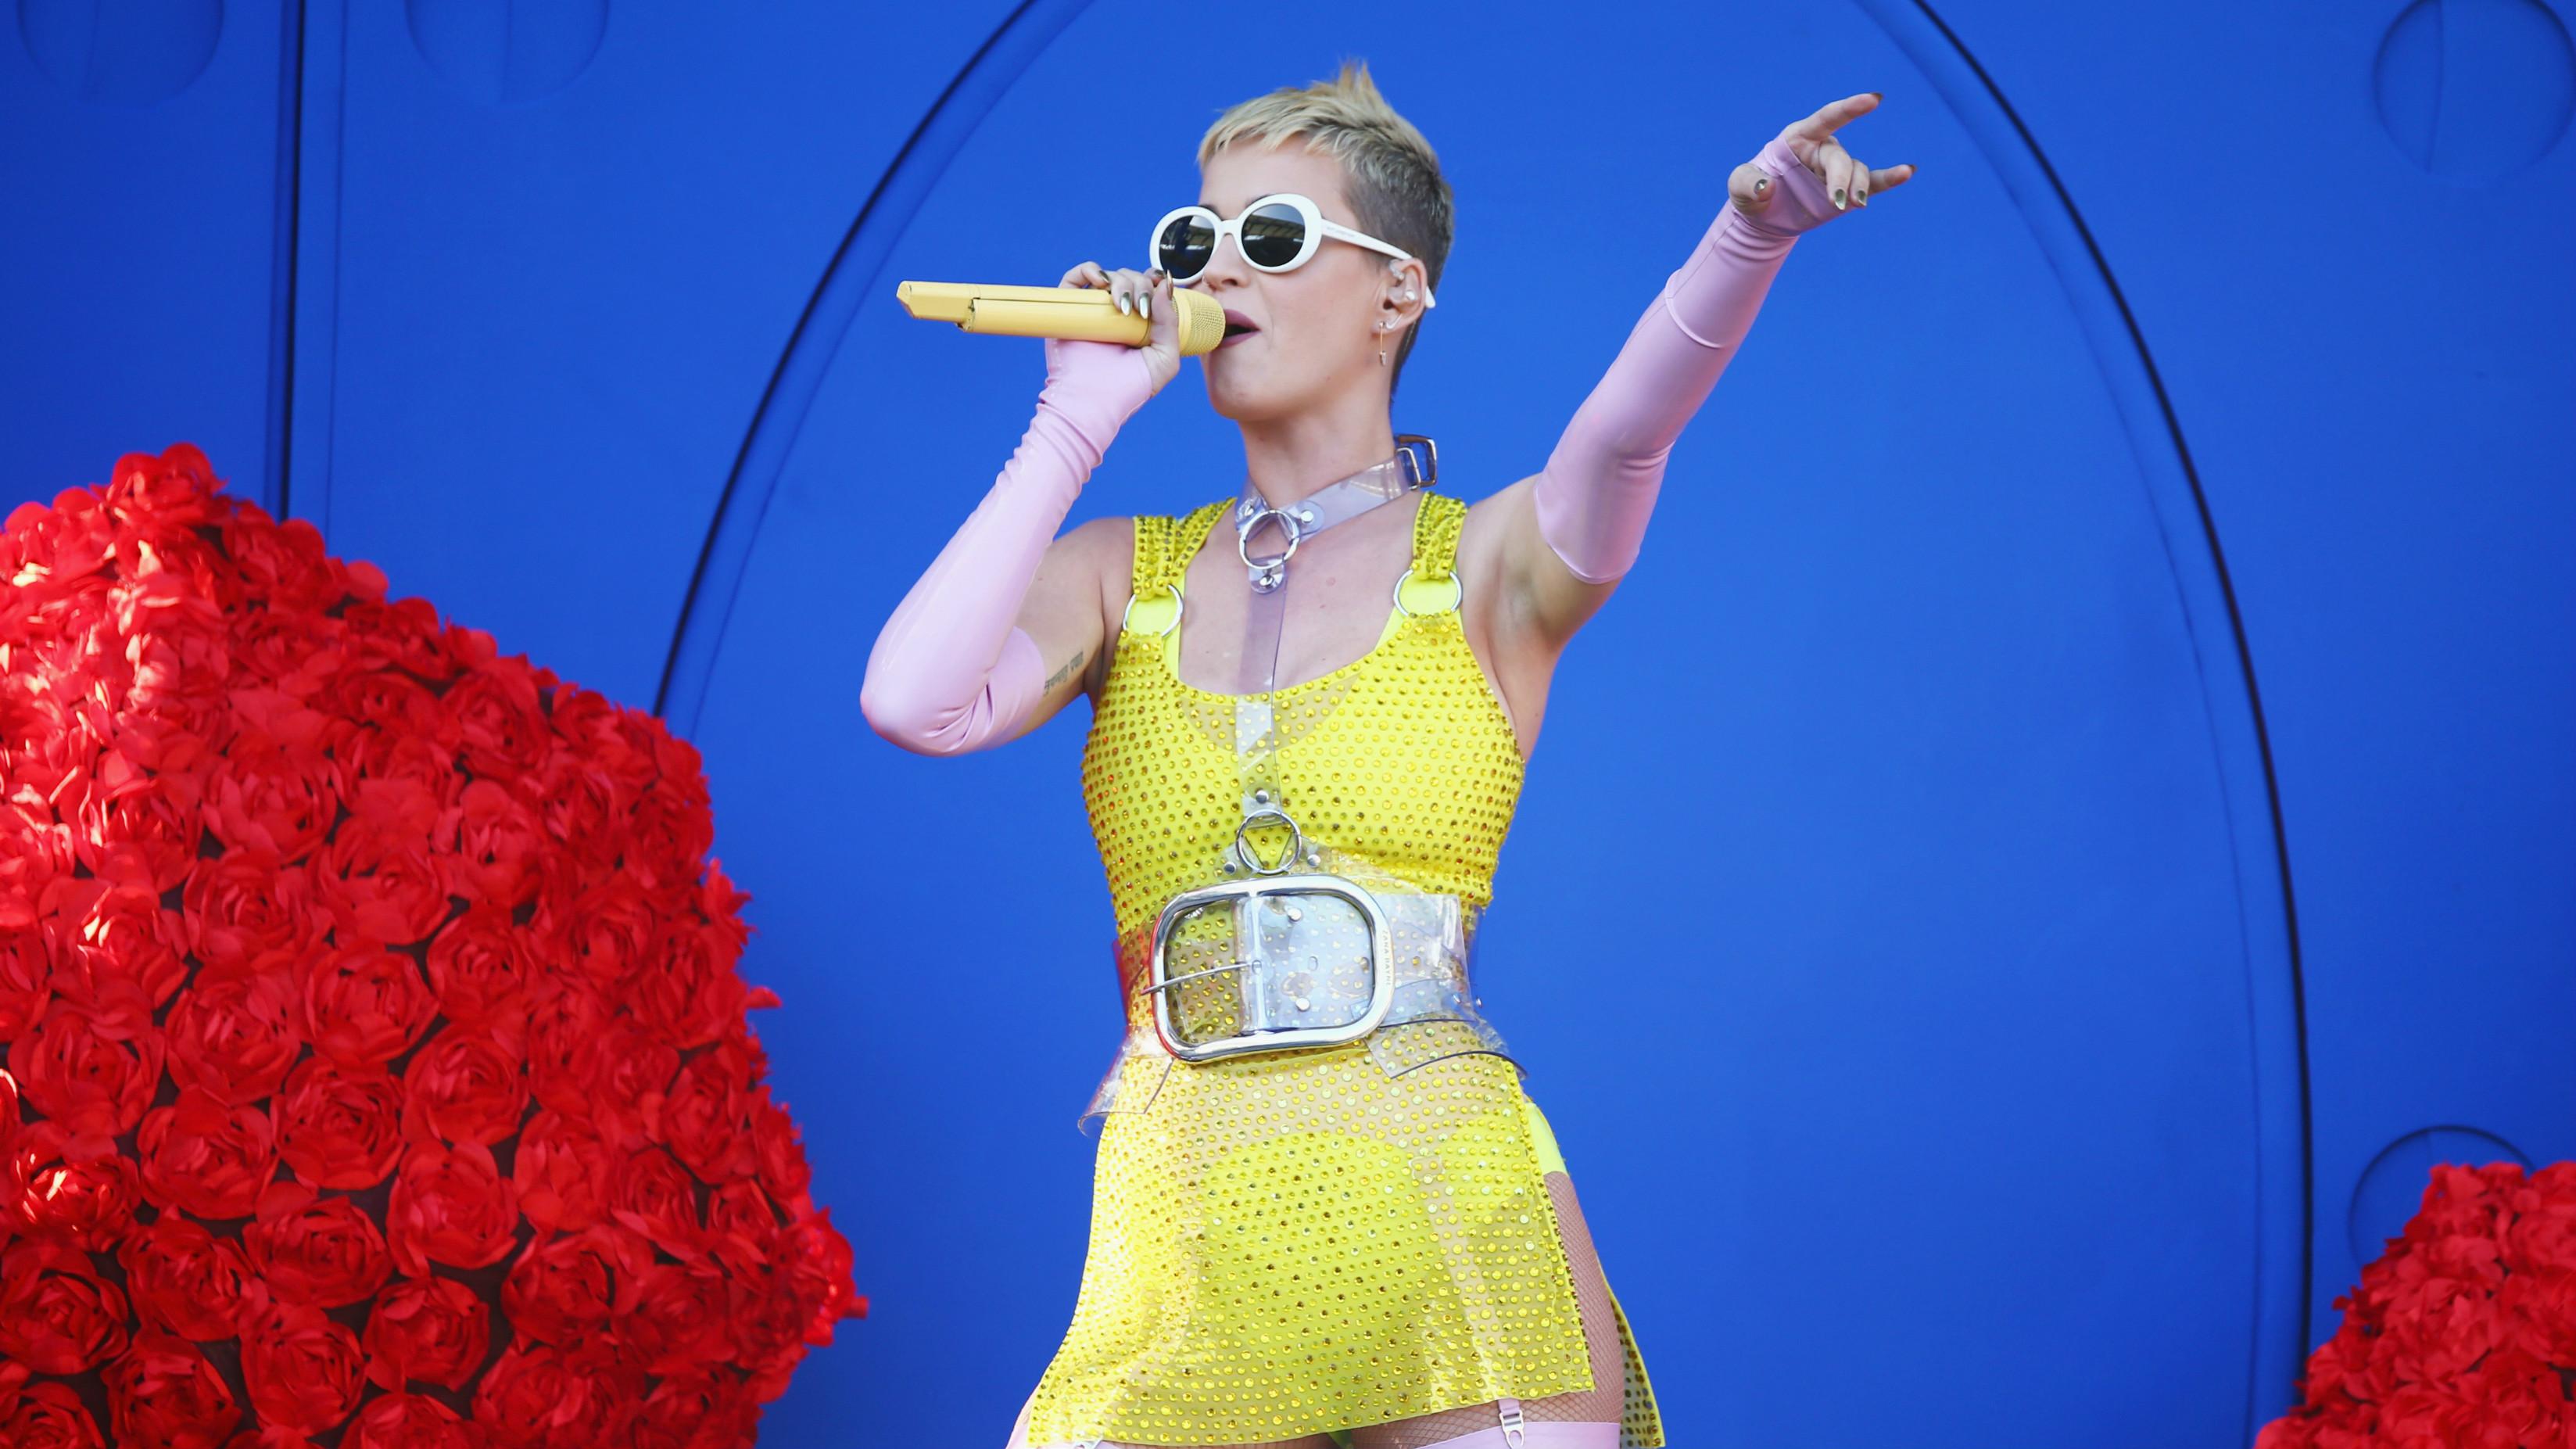 Katy Perry Bringing Tour To Houston In 2018 Khou Com